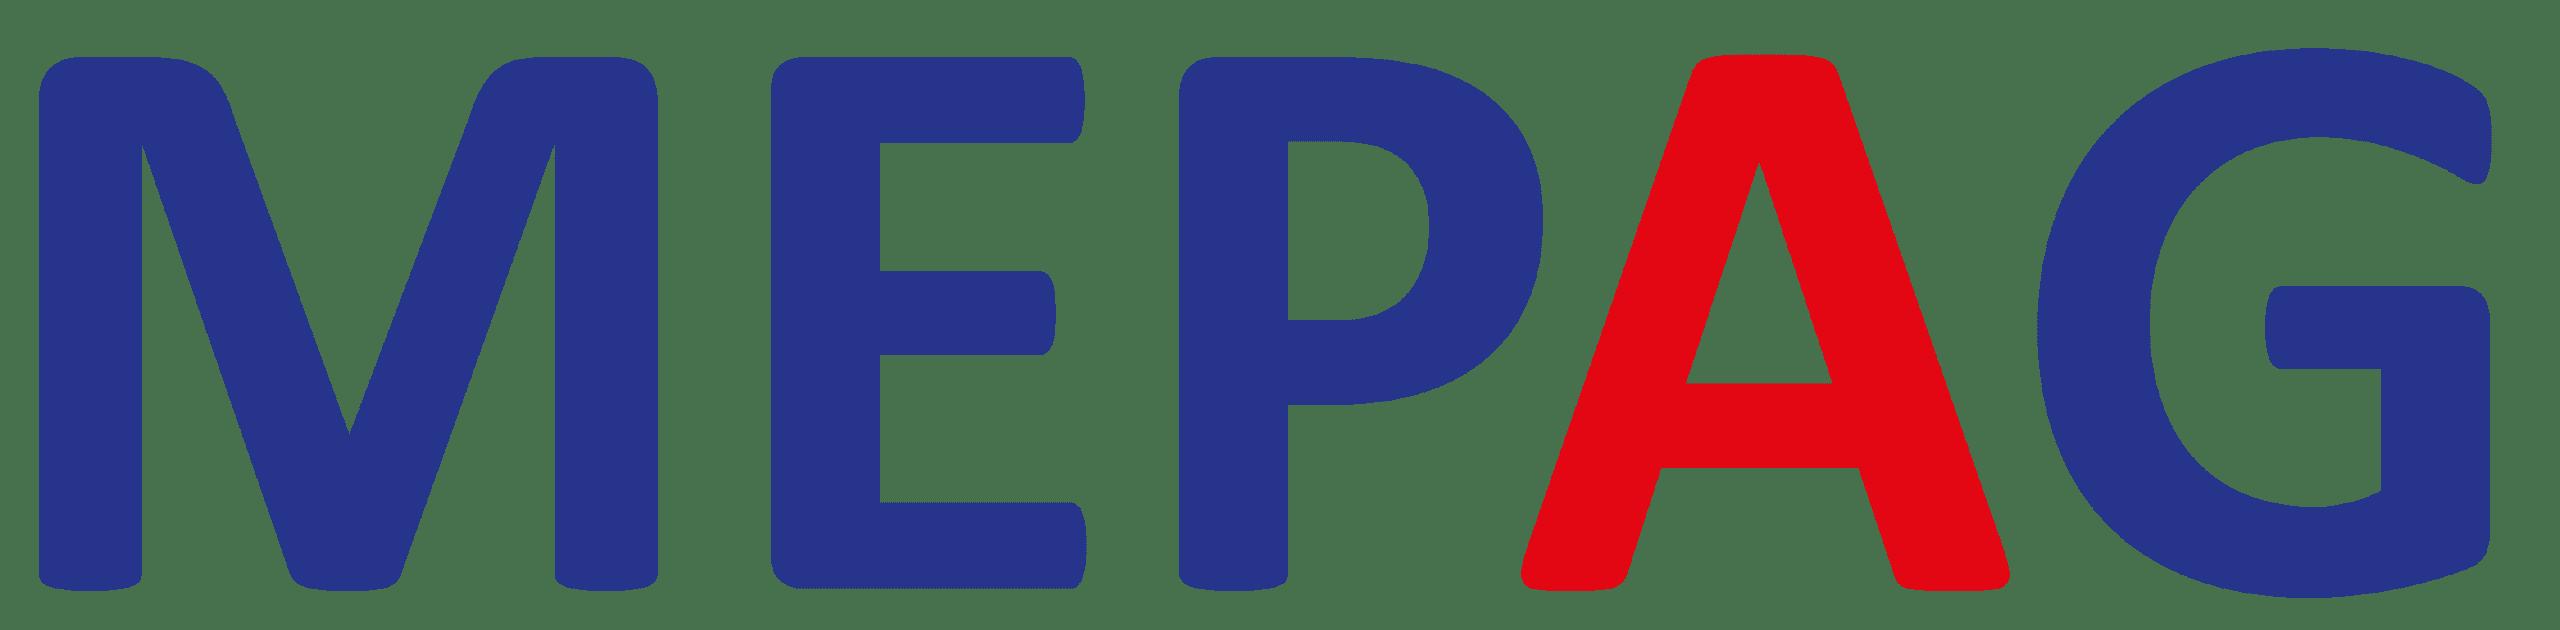 Mepag